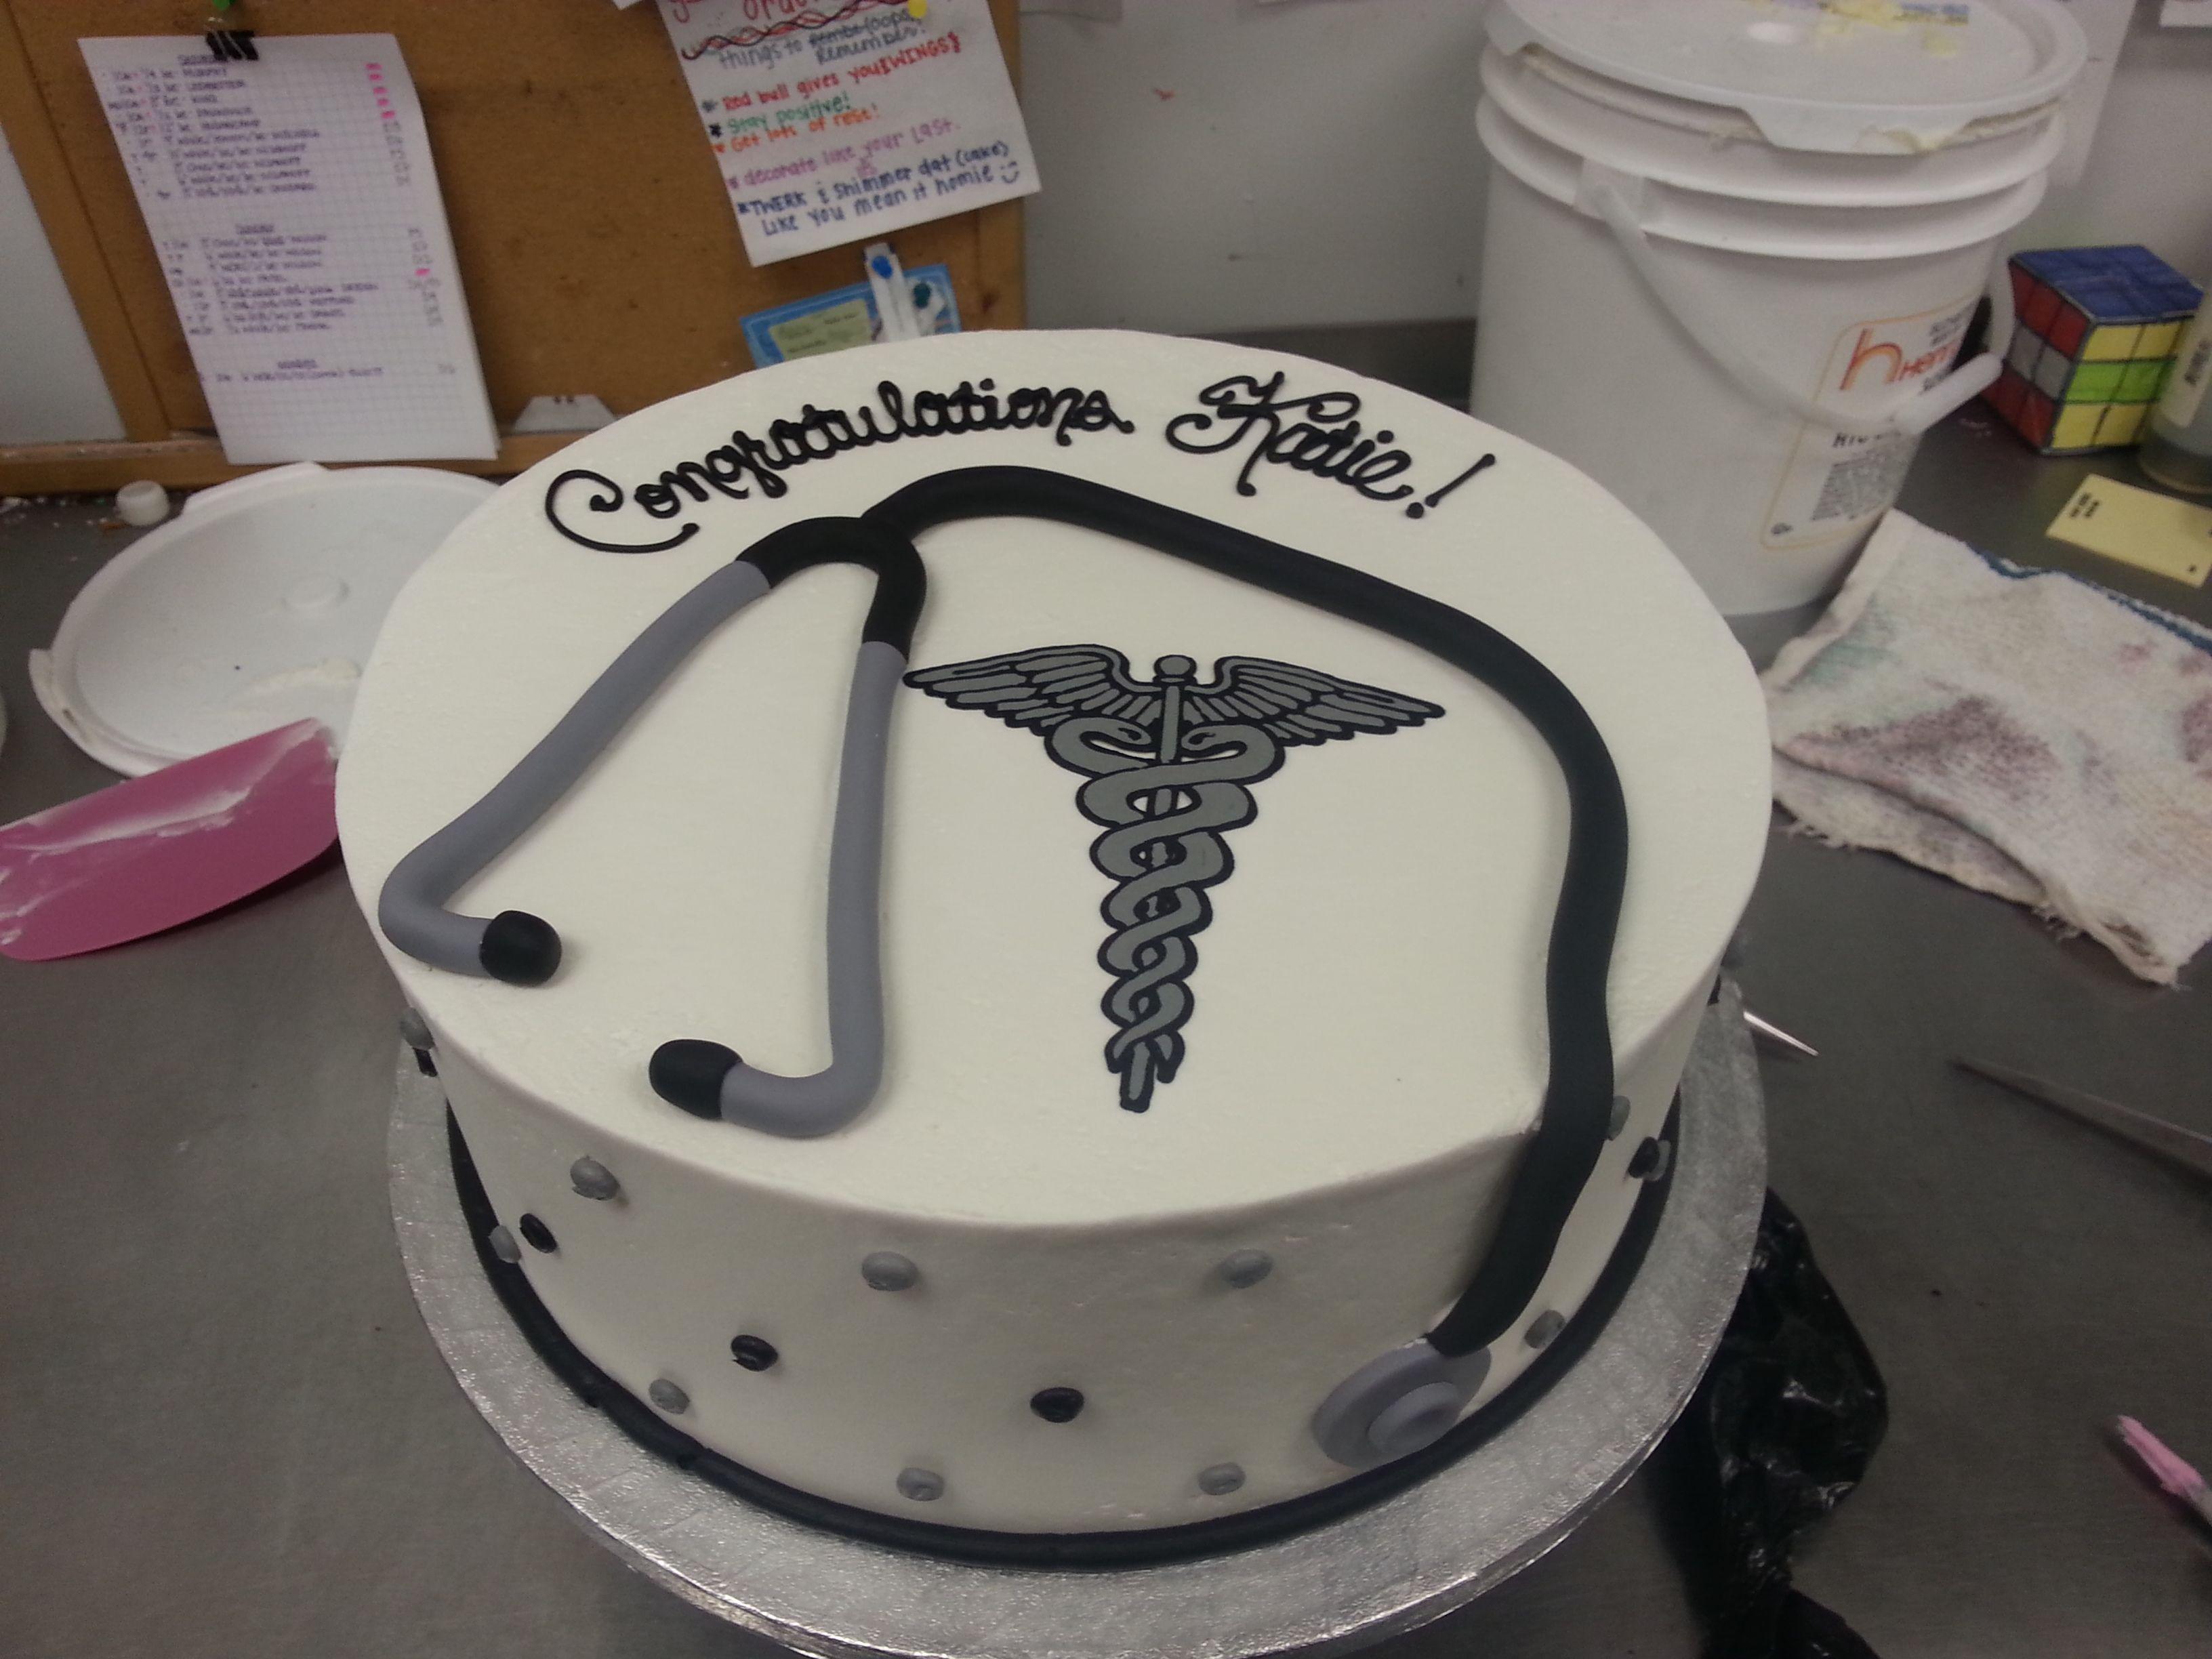 Caduceus And Fondant Stethoscope Cake Cakes I Ve Made Cake